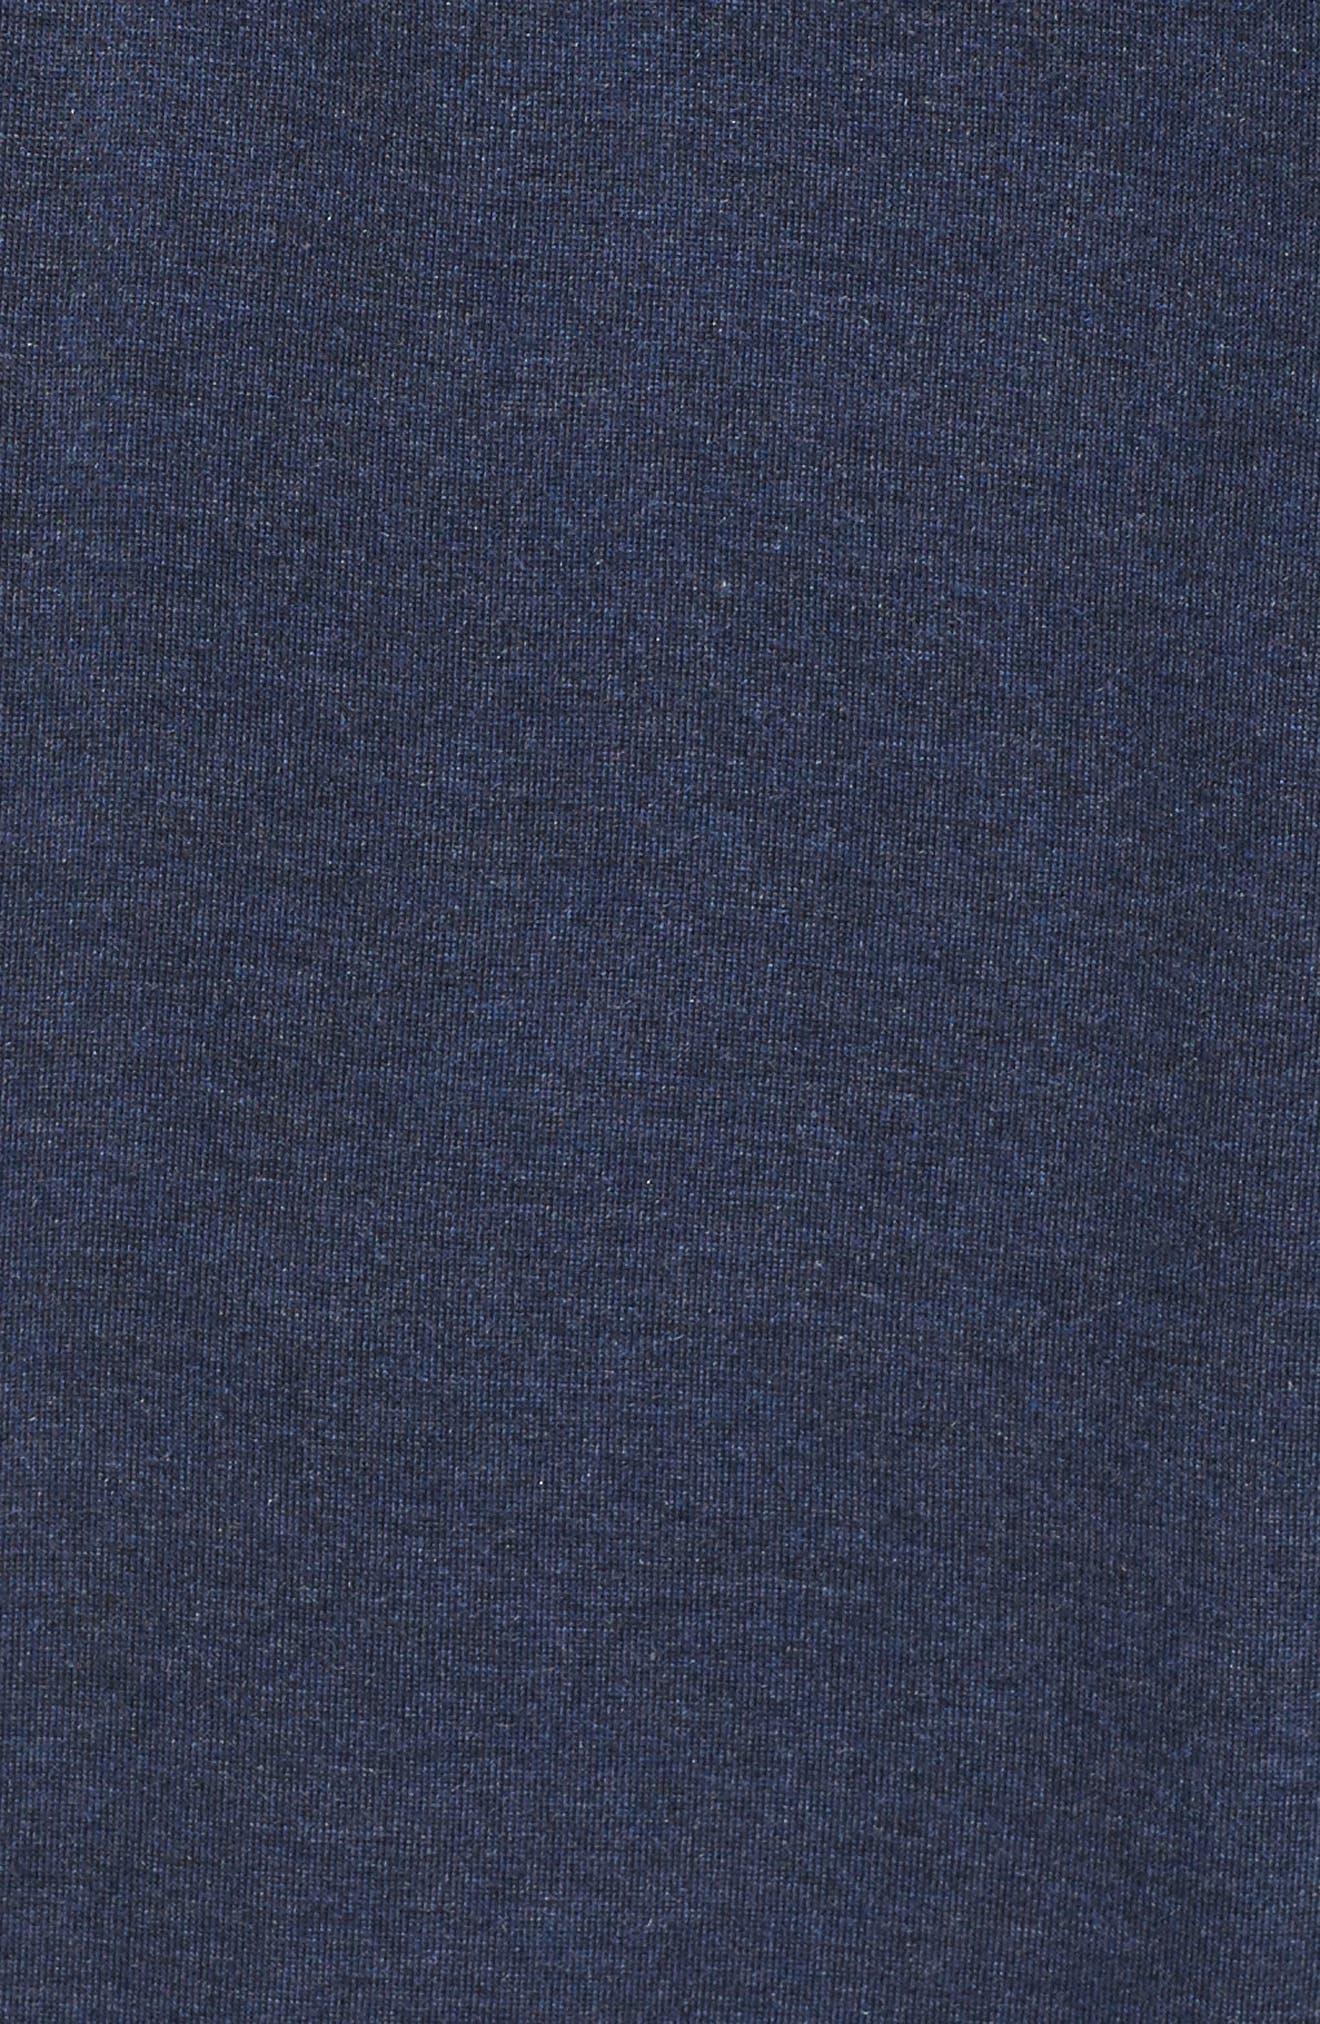 Jersey Robe,                             Alternate thumbnail 5, color,                             400